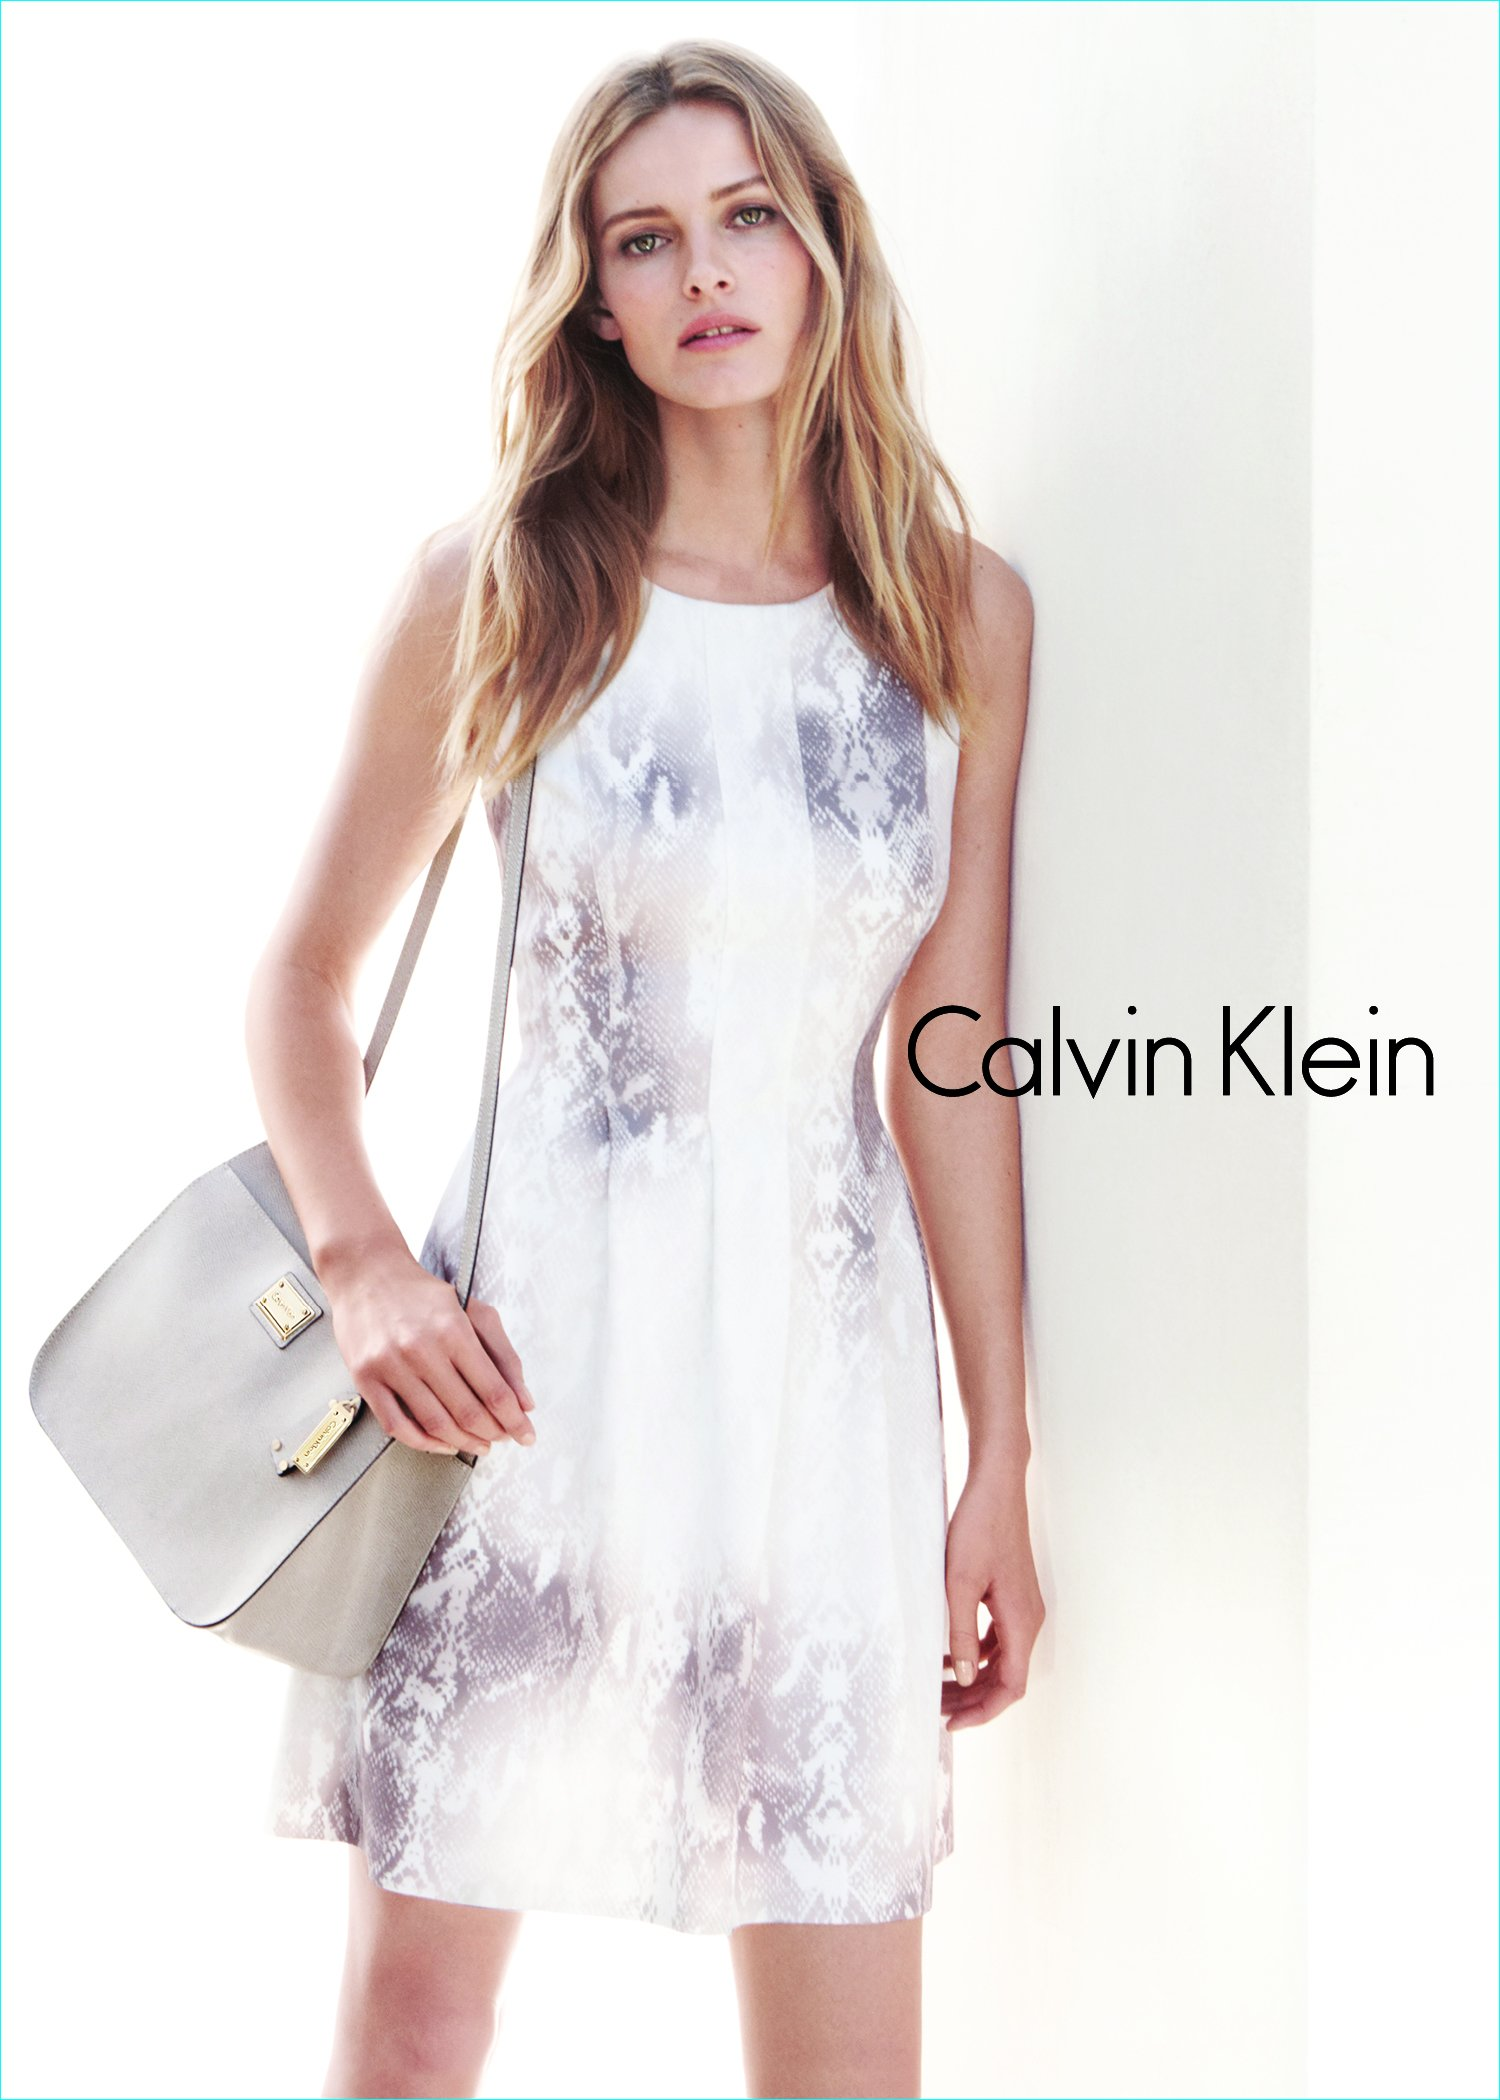 calvin-klein-white-label-s15-w_ph_dan-jackson_sg02